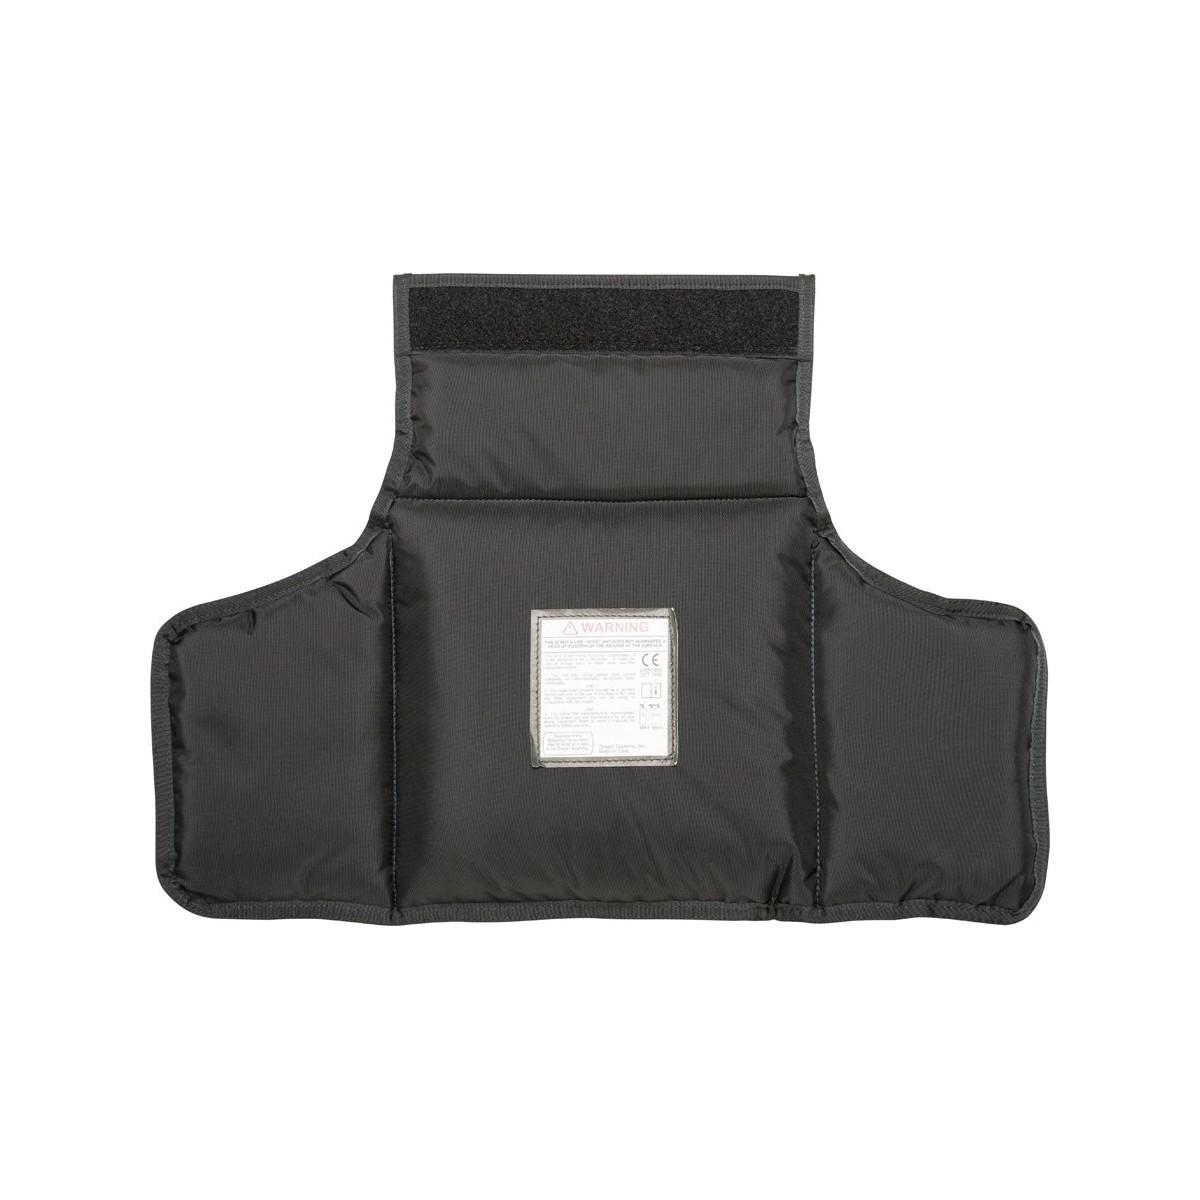 Zeagle Full Lumbar Pad